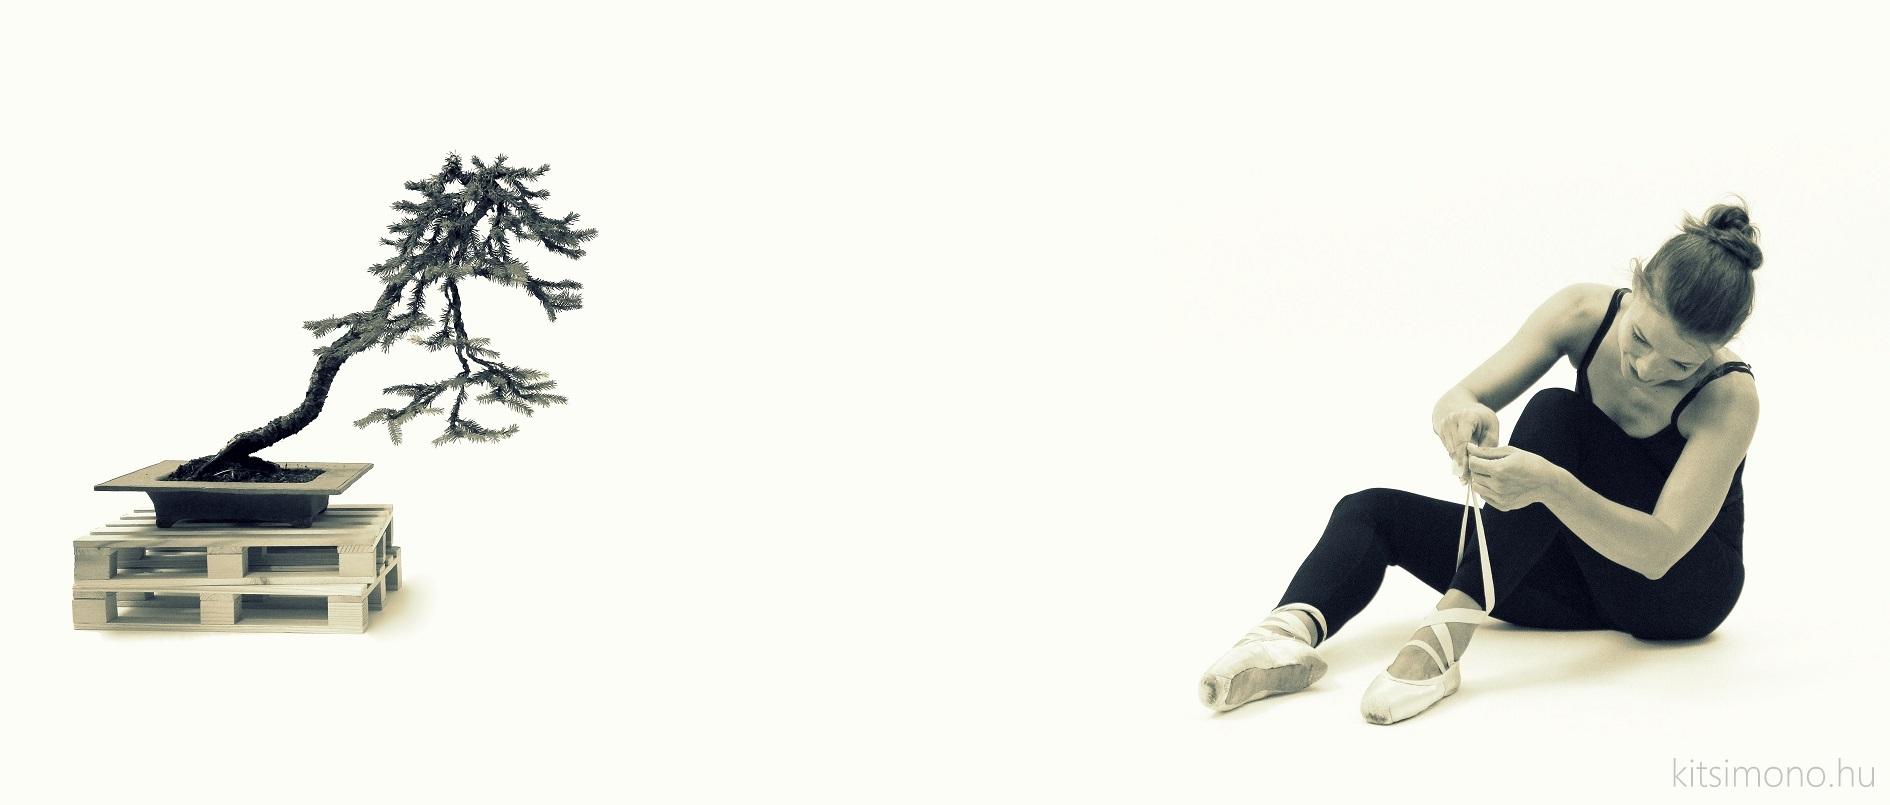 picea literati bunjin bonsai ballet kitsimono art experiments (9)